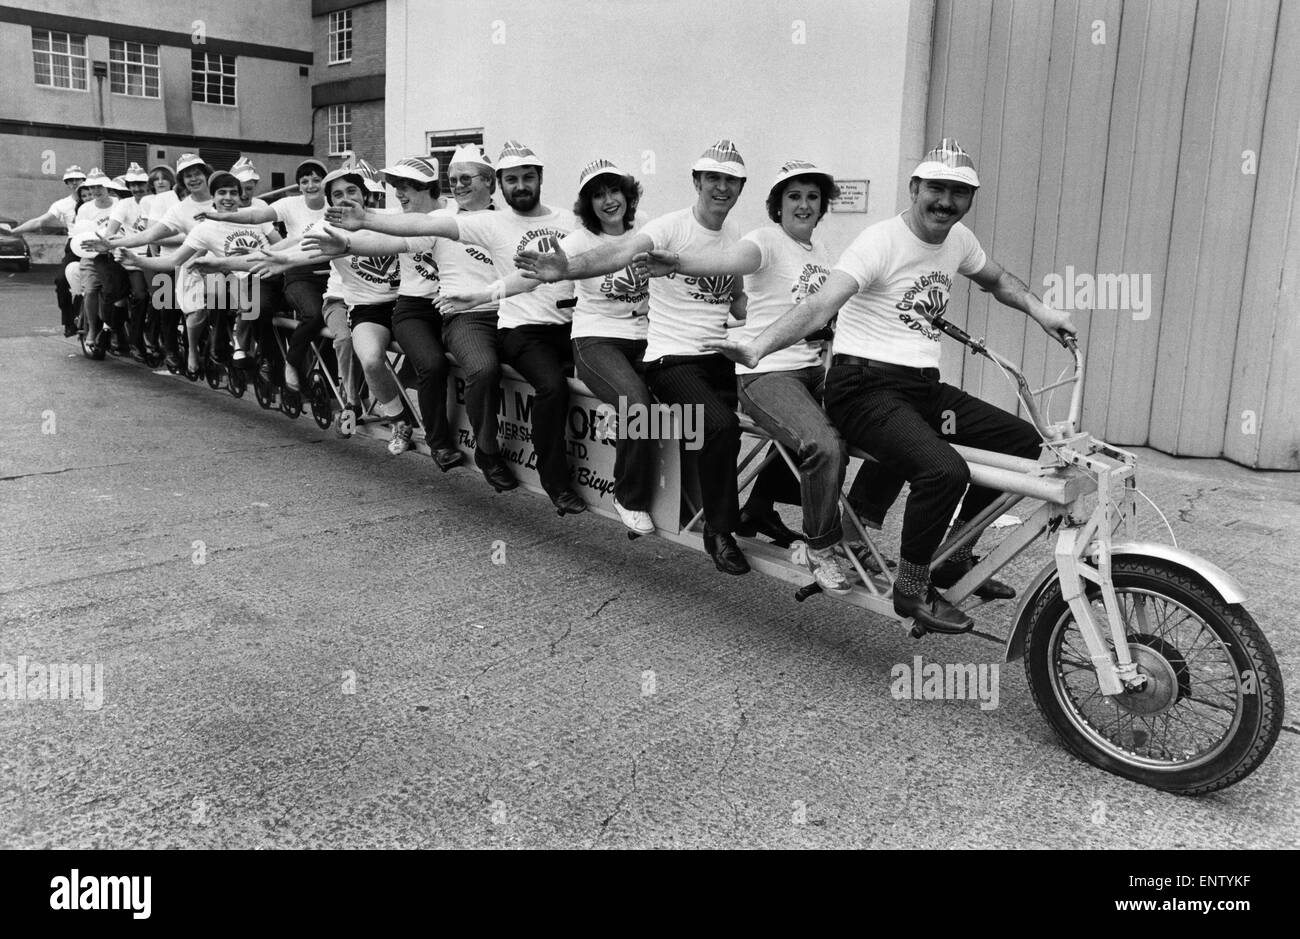 24 seater bike ridden by Debenham's Crew to promote British Week in their stores. Circa 1979 - Stock Image